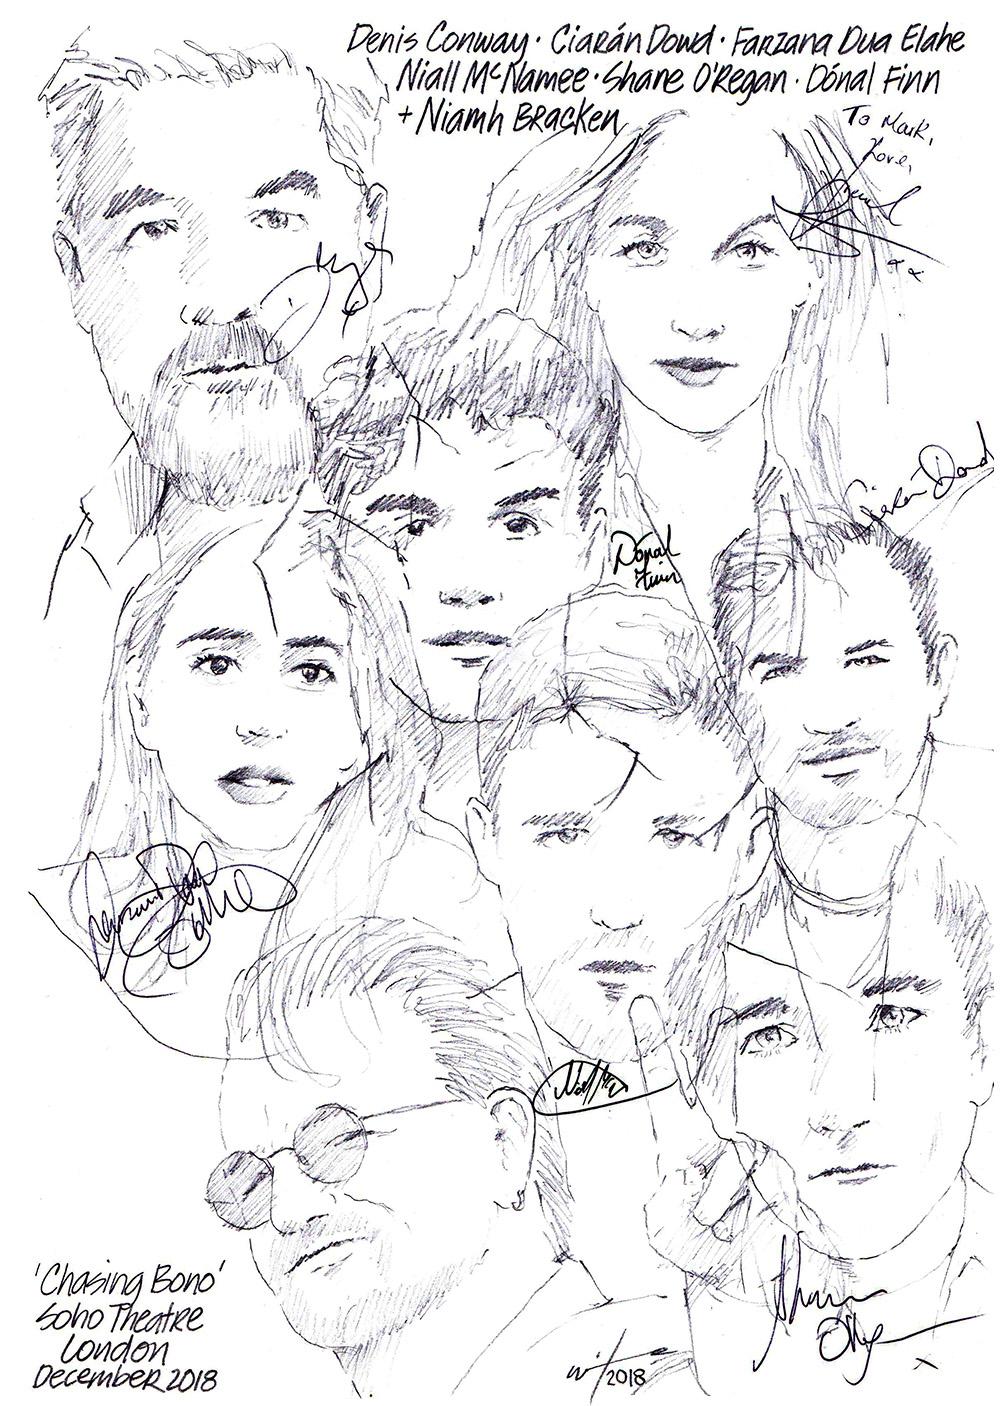 Autographed drawing of Denis Conway, Ciaran Dowd, Farzana Dua Elahe, Naill McNamee, Shane O'Regan, Donal Finn and Niamh Bracken in Chasing Bono at London's Soho Theatre